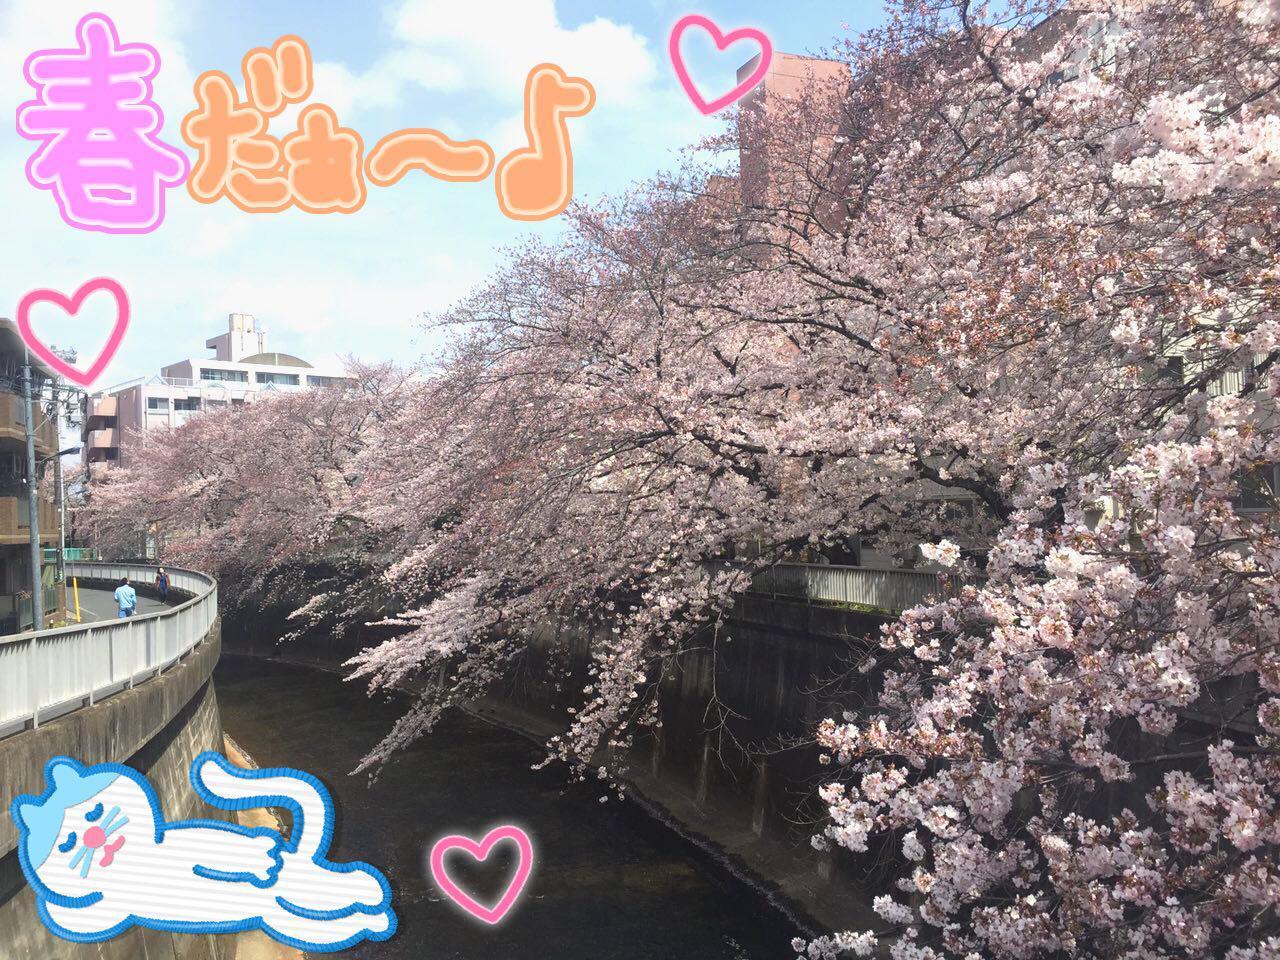 photo_2017-04-06_22-49-52.jpg